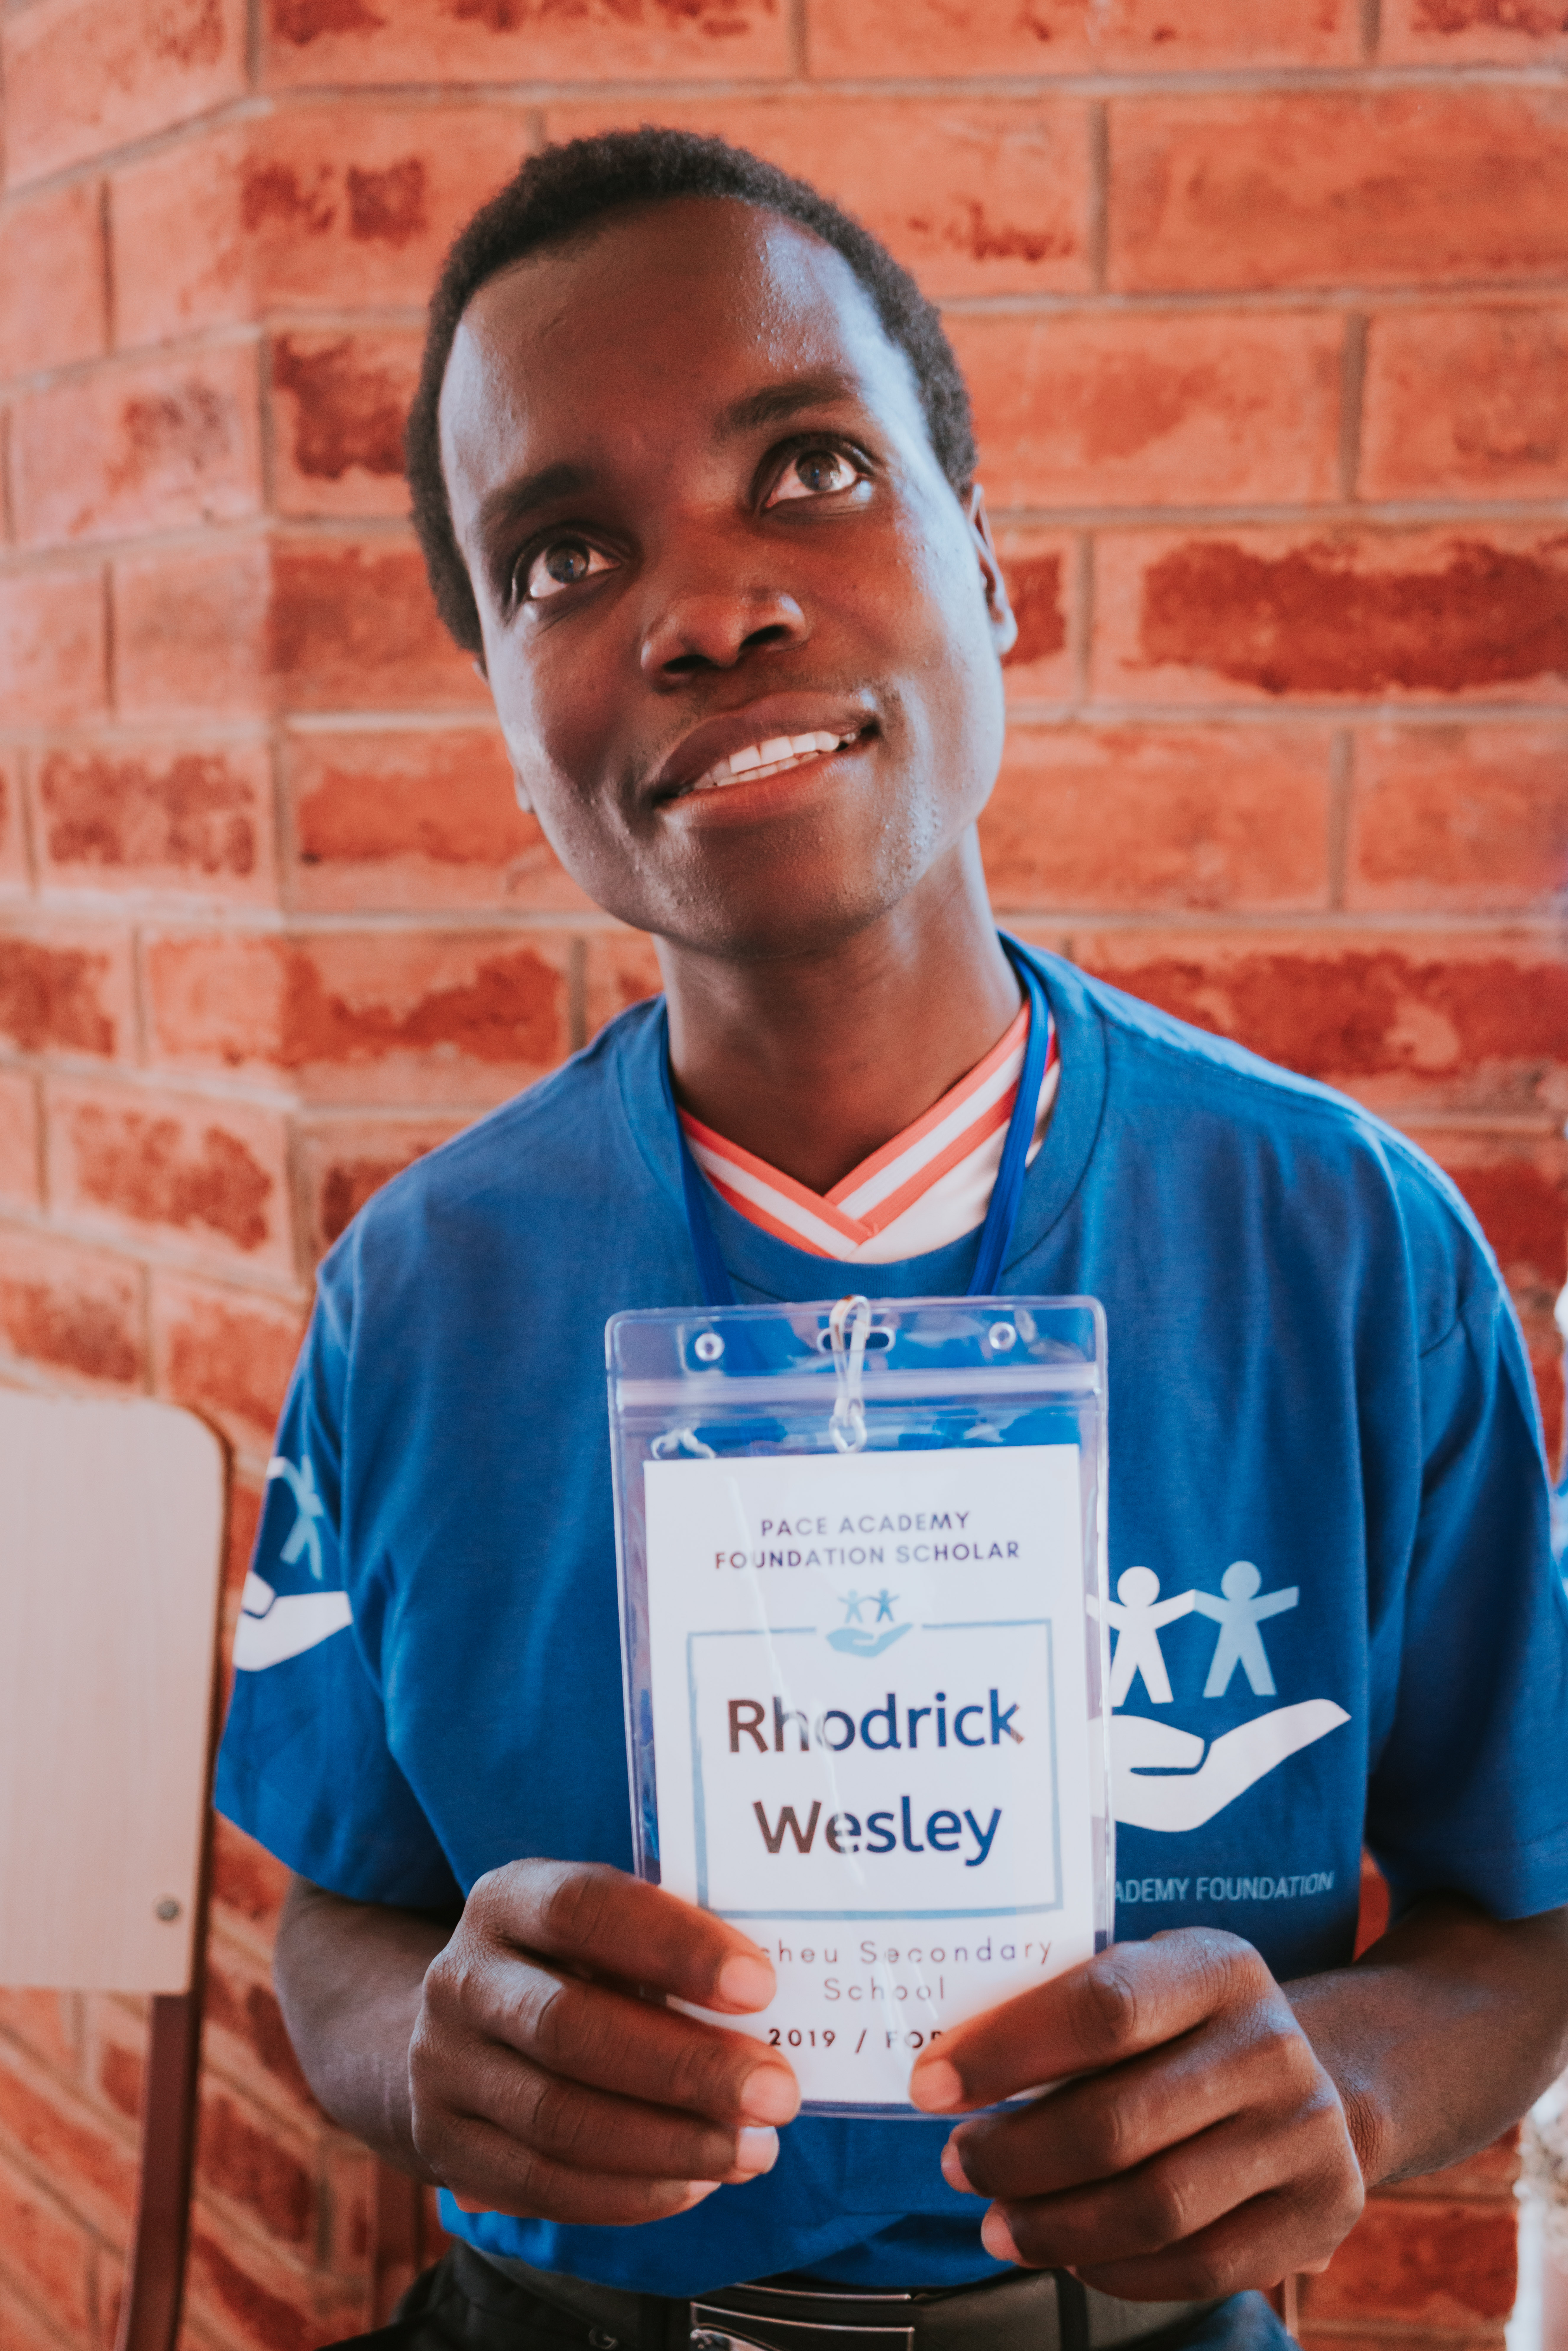 Rhodrick Wesley (Ntcheu Secondary School